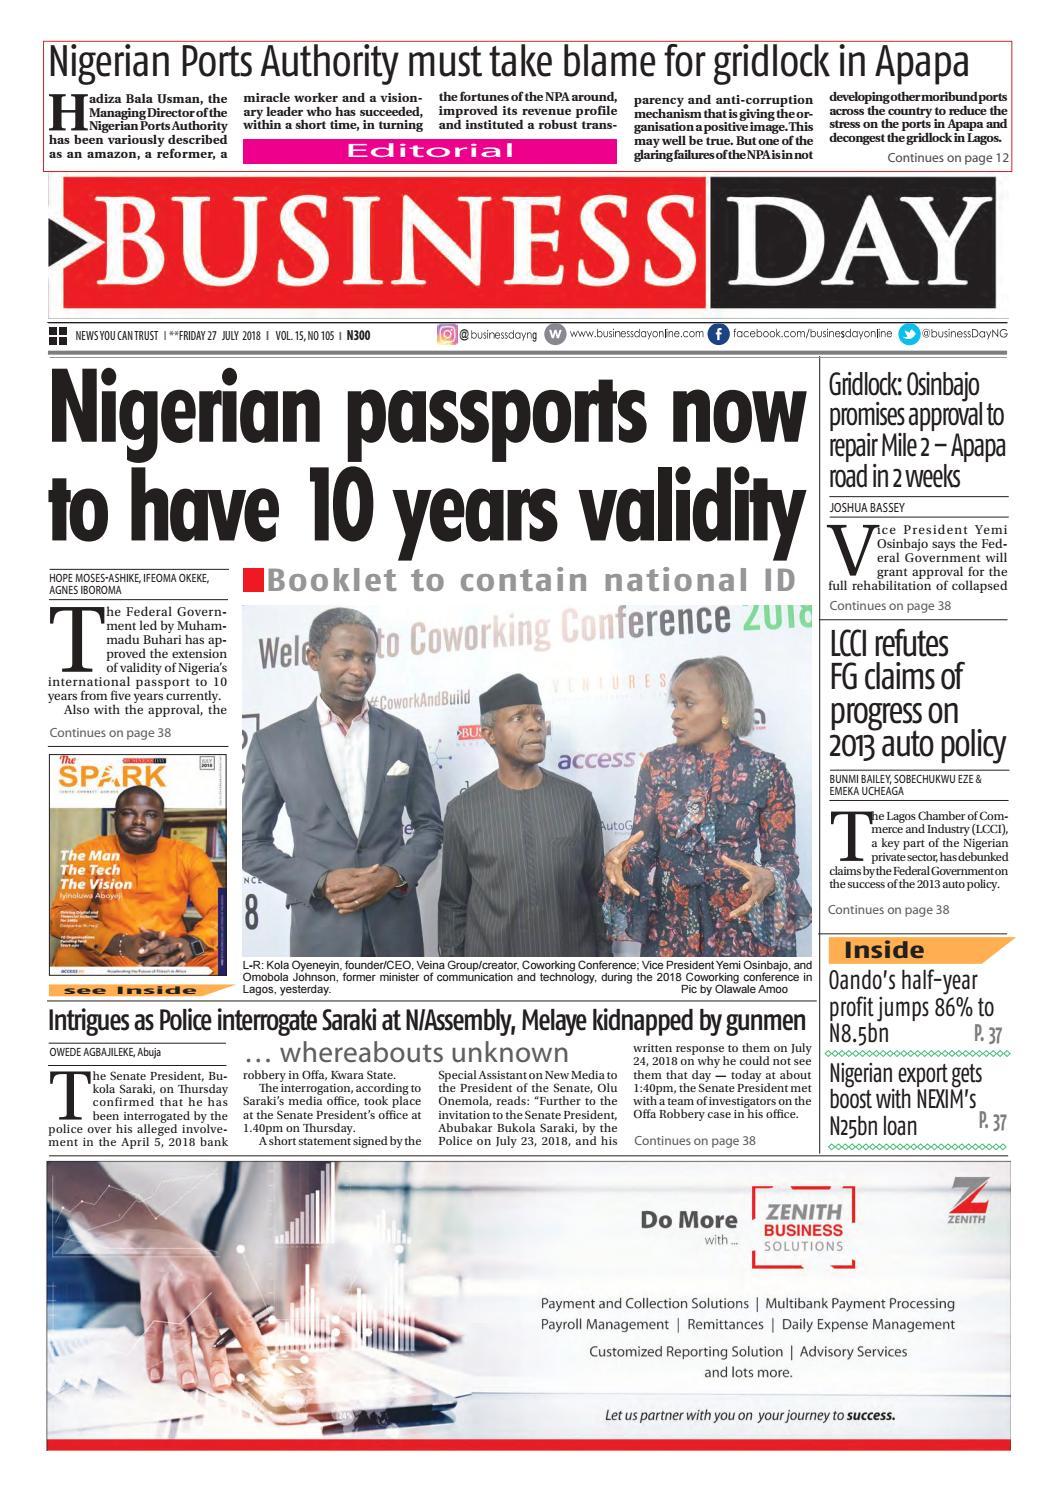 BusinessDay 27 Jul 2018 by BusinessDay - issuu